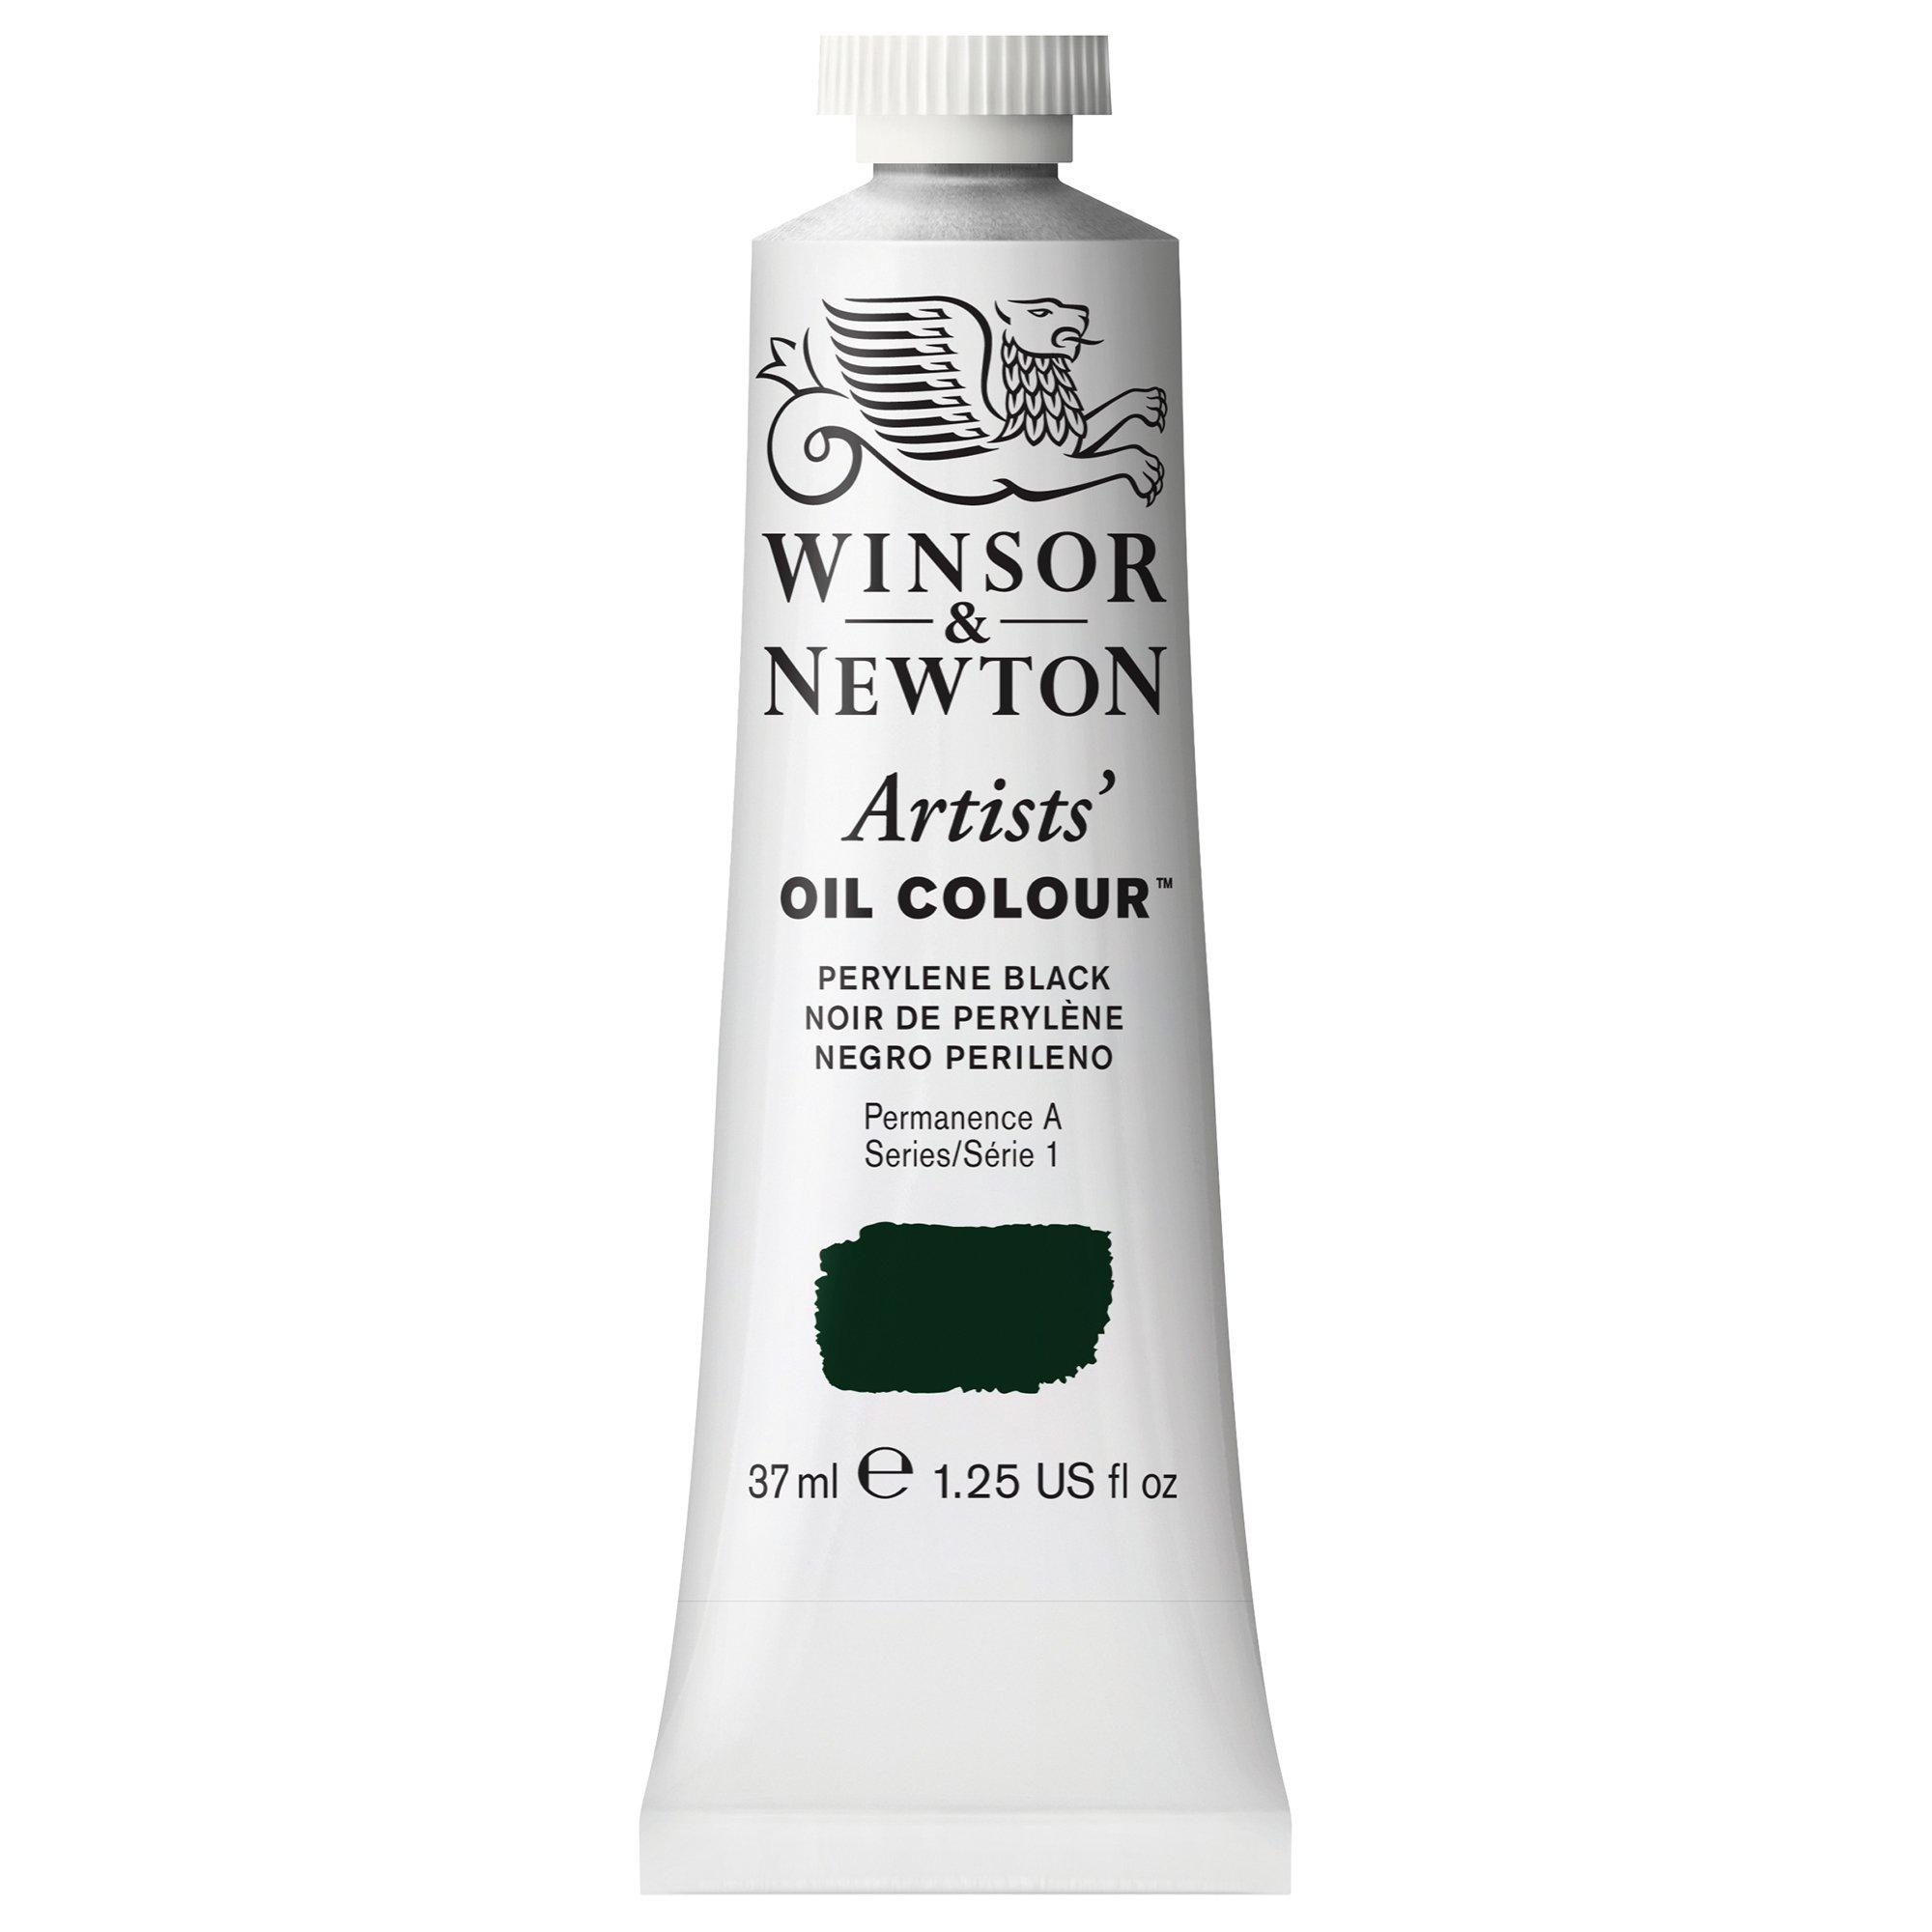 Winsor & Newton Artists' Oil Colour Paint, 37ml Tube, Perylene Black